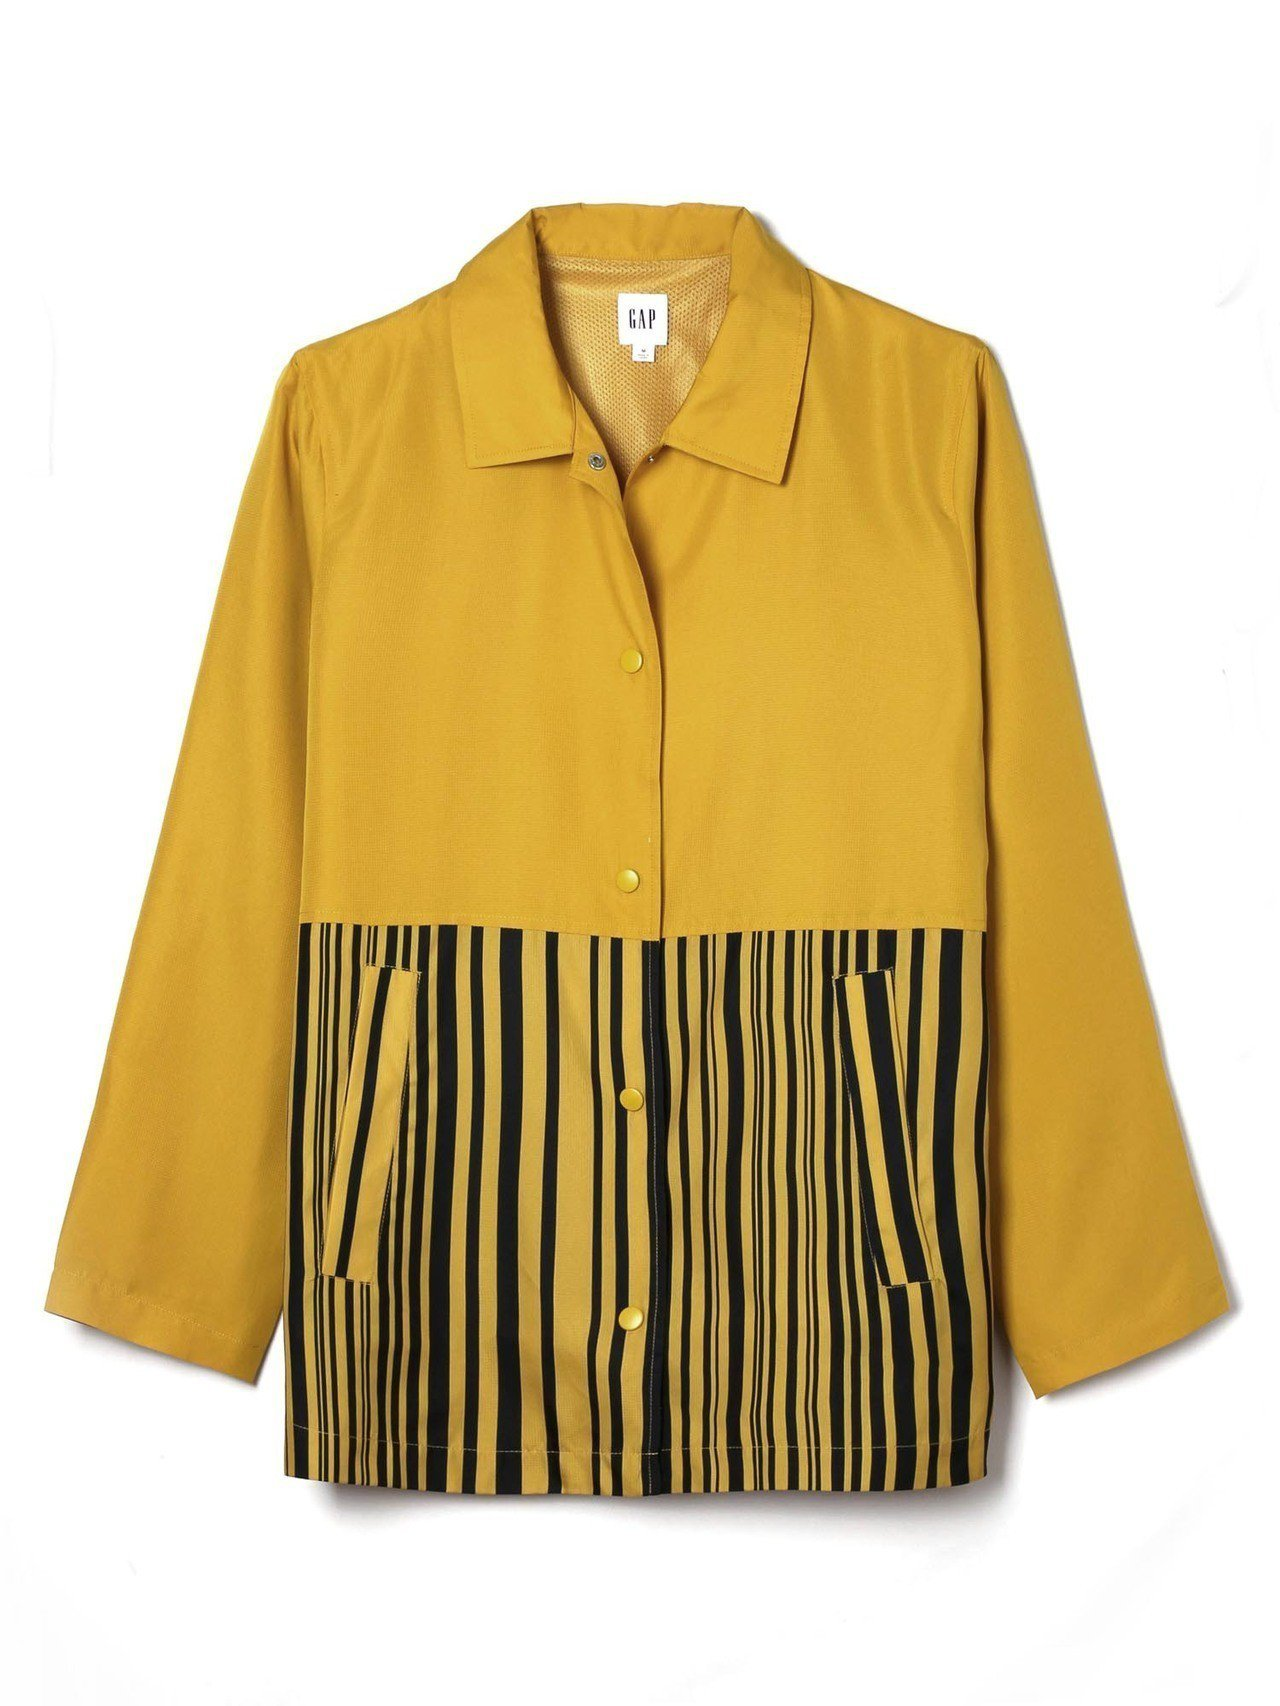 GAP與Constance Tsui聯名系列拼接設計夾克,約2,699元。